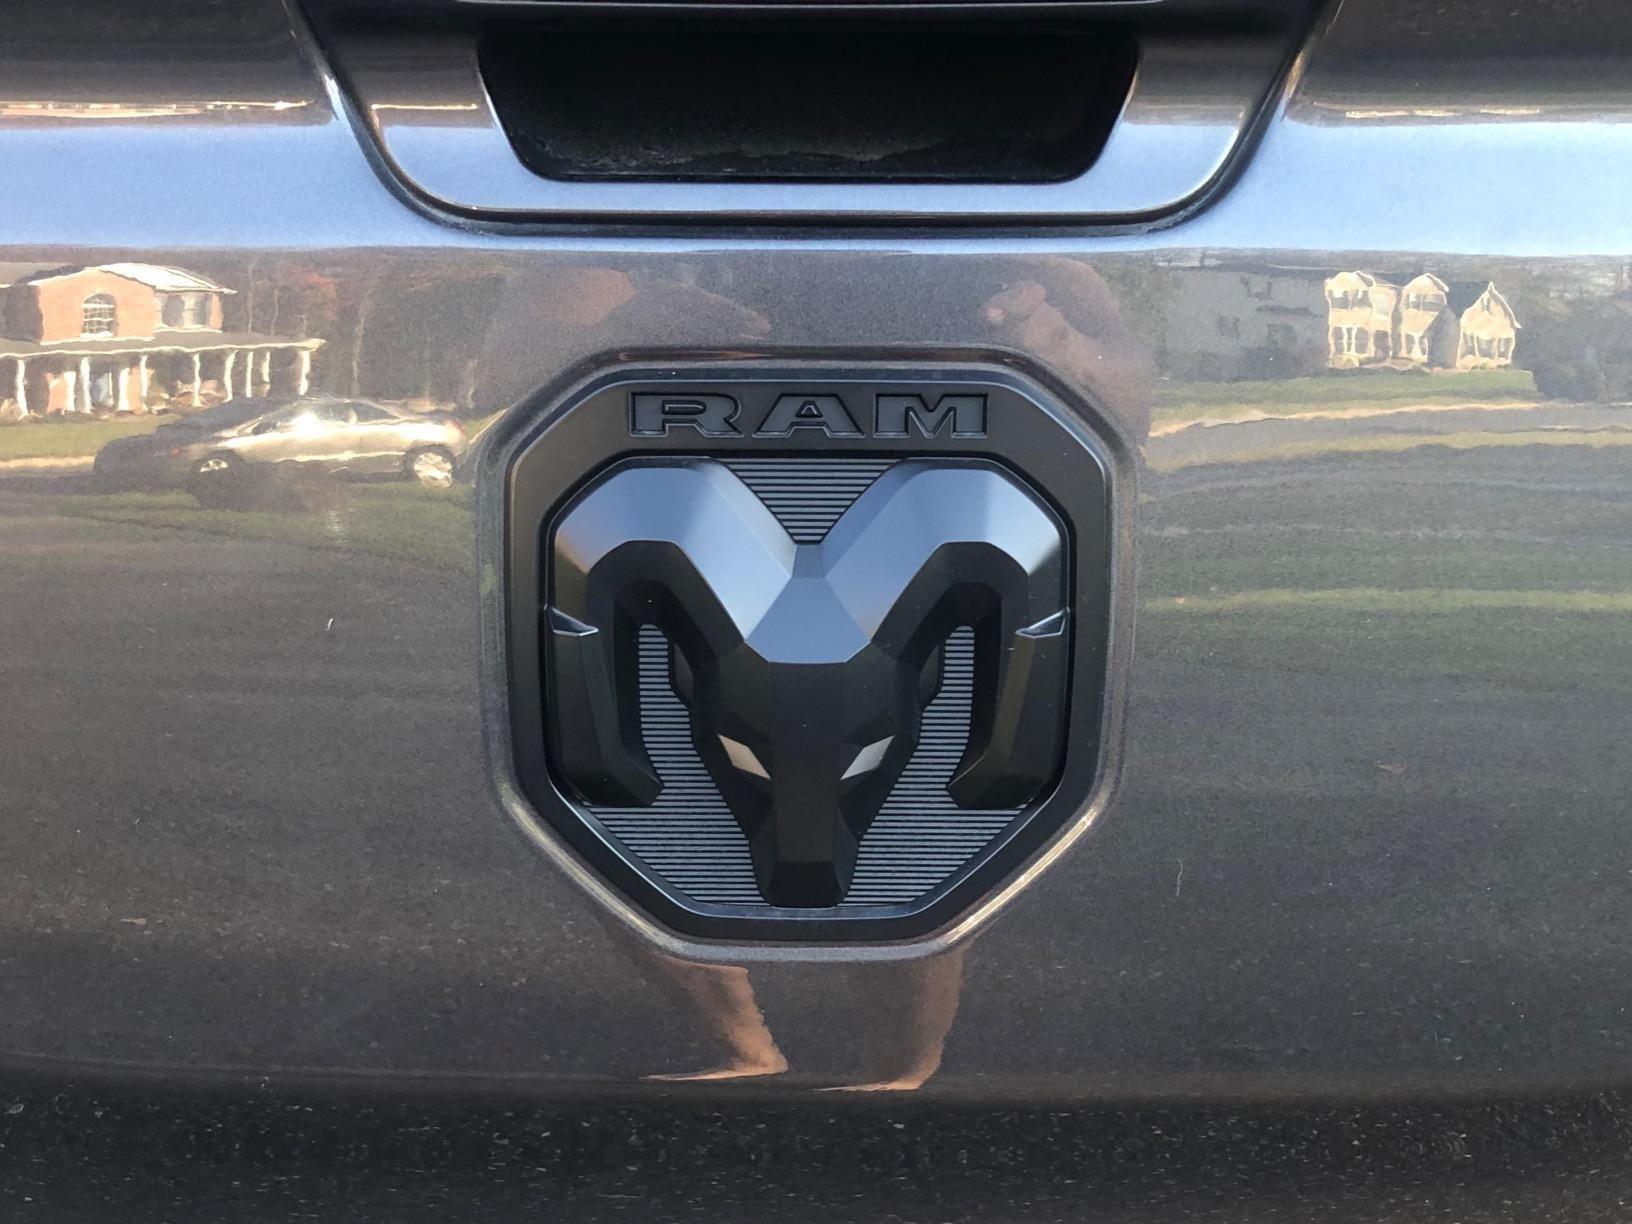 Dodge Ram 1500 Dt Tailgate Emblem 2019 Dodge Ram 1500 Dodge Ram Ram 1500 Accessories